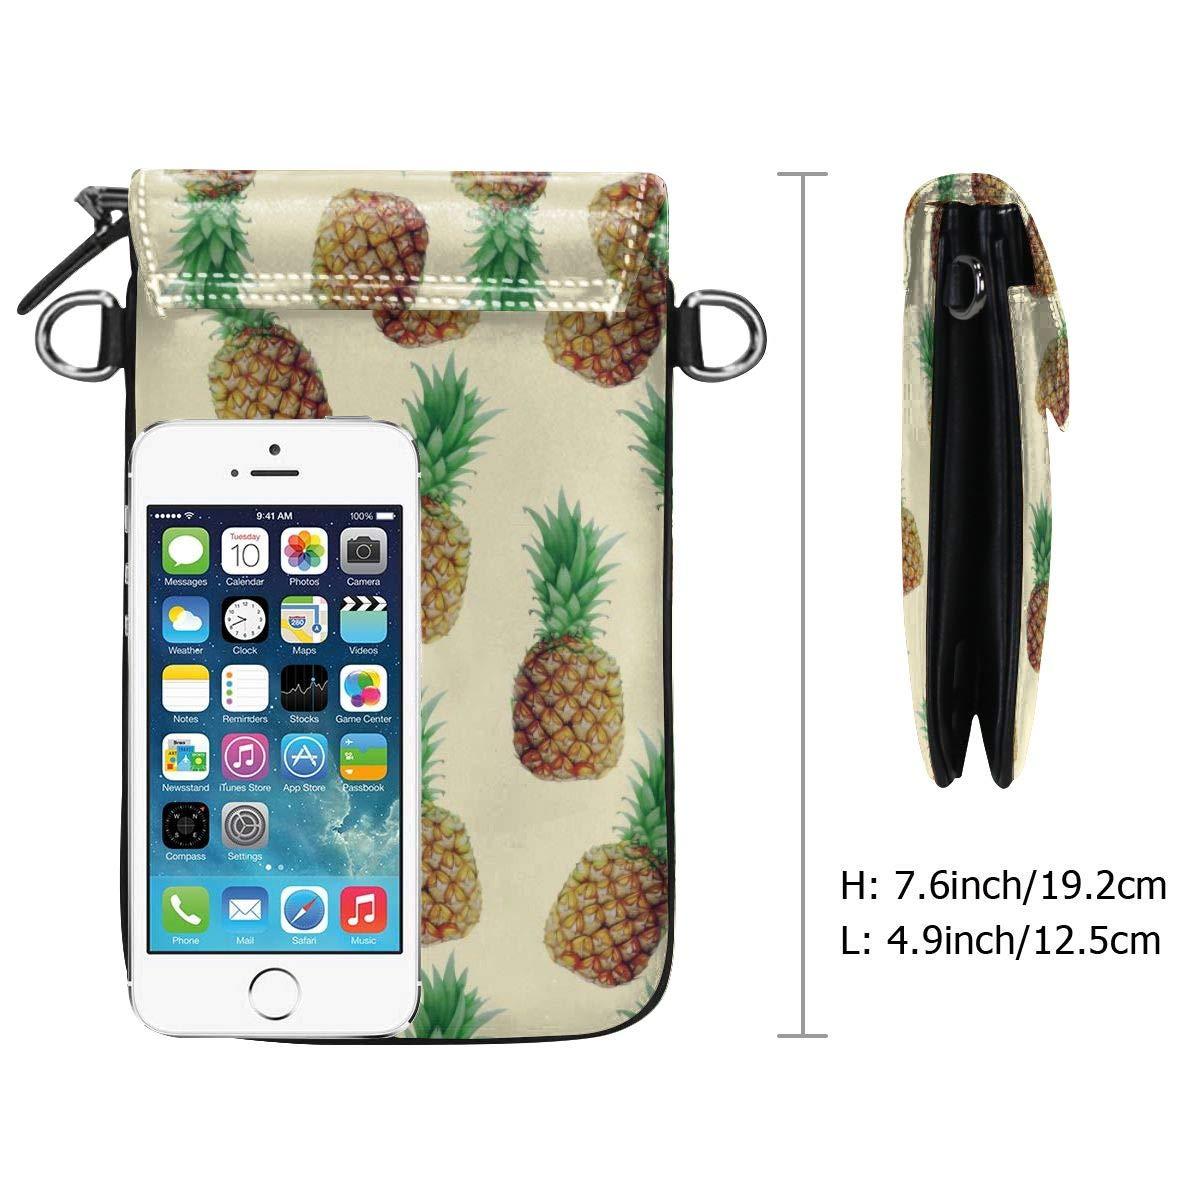 V5DGFJH.B Womens Crossbody Cell Phone Bags Fruit Pineapple Girls Small Credit Card Shoulder Handbag Coin Purse